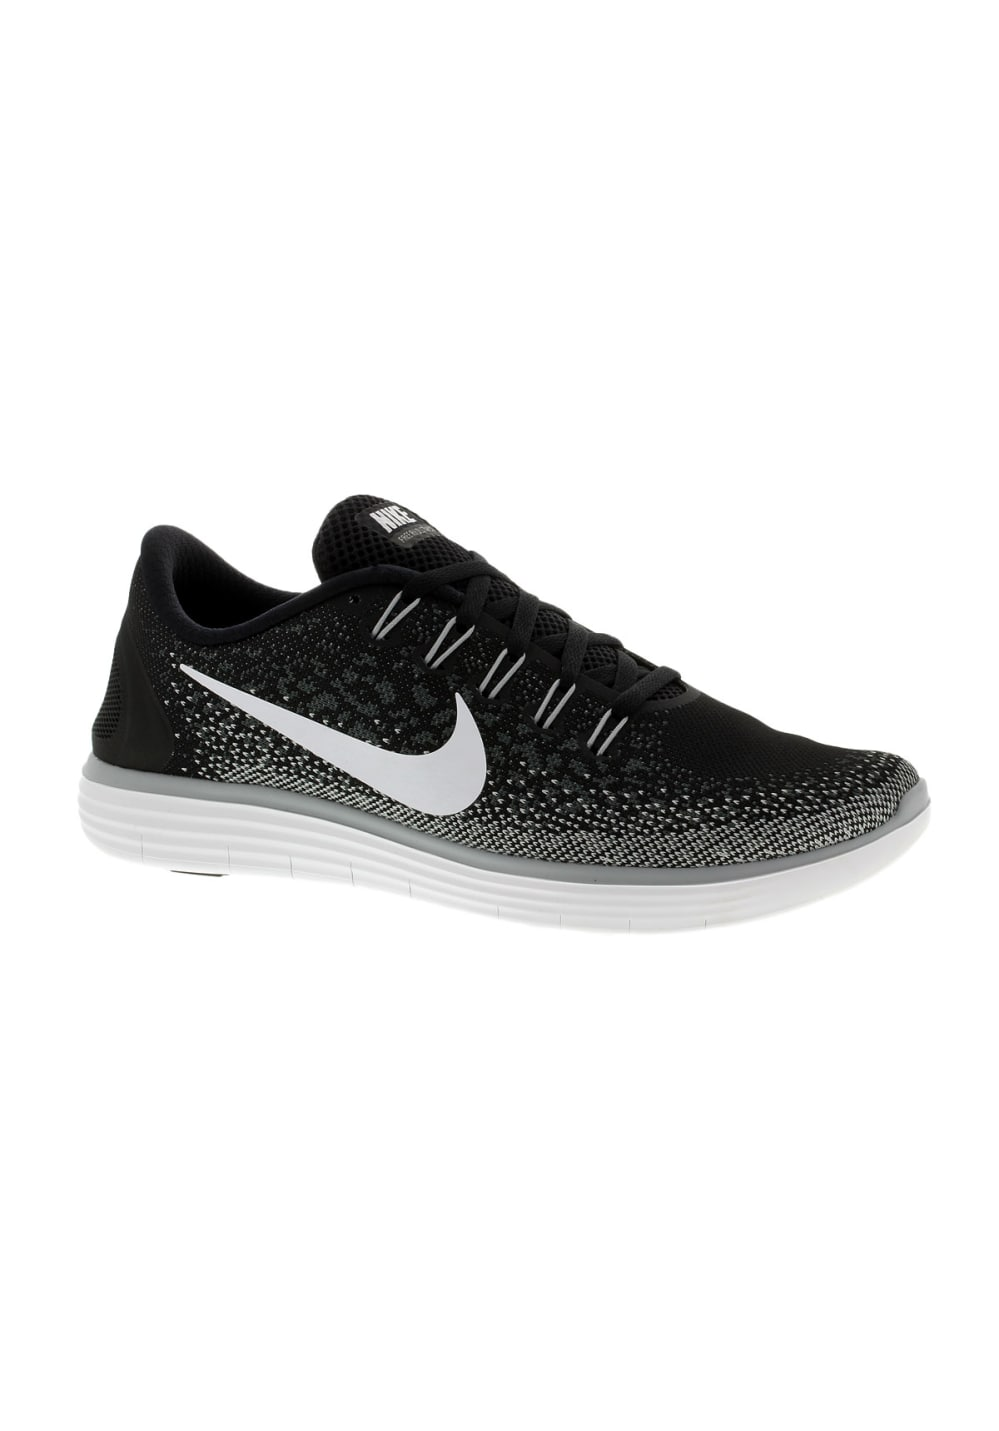 4846559557fd4 Nike Free Run Distance - Running shoes for Women - Black